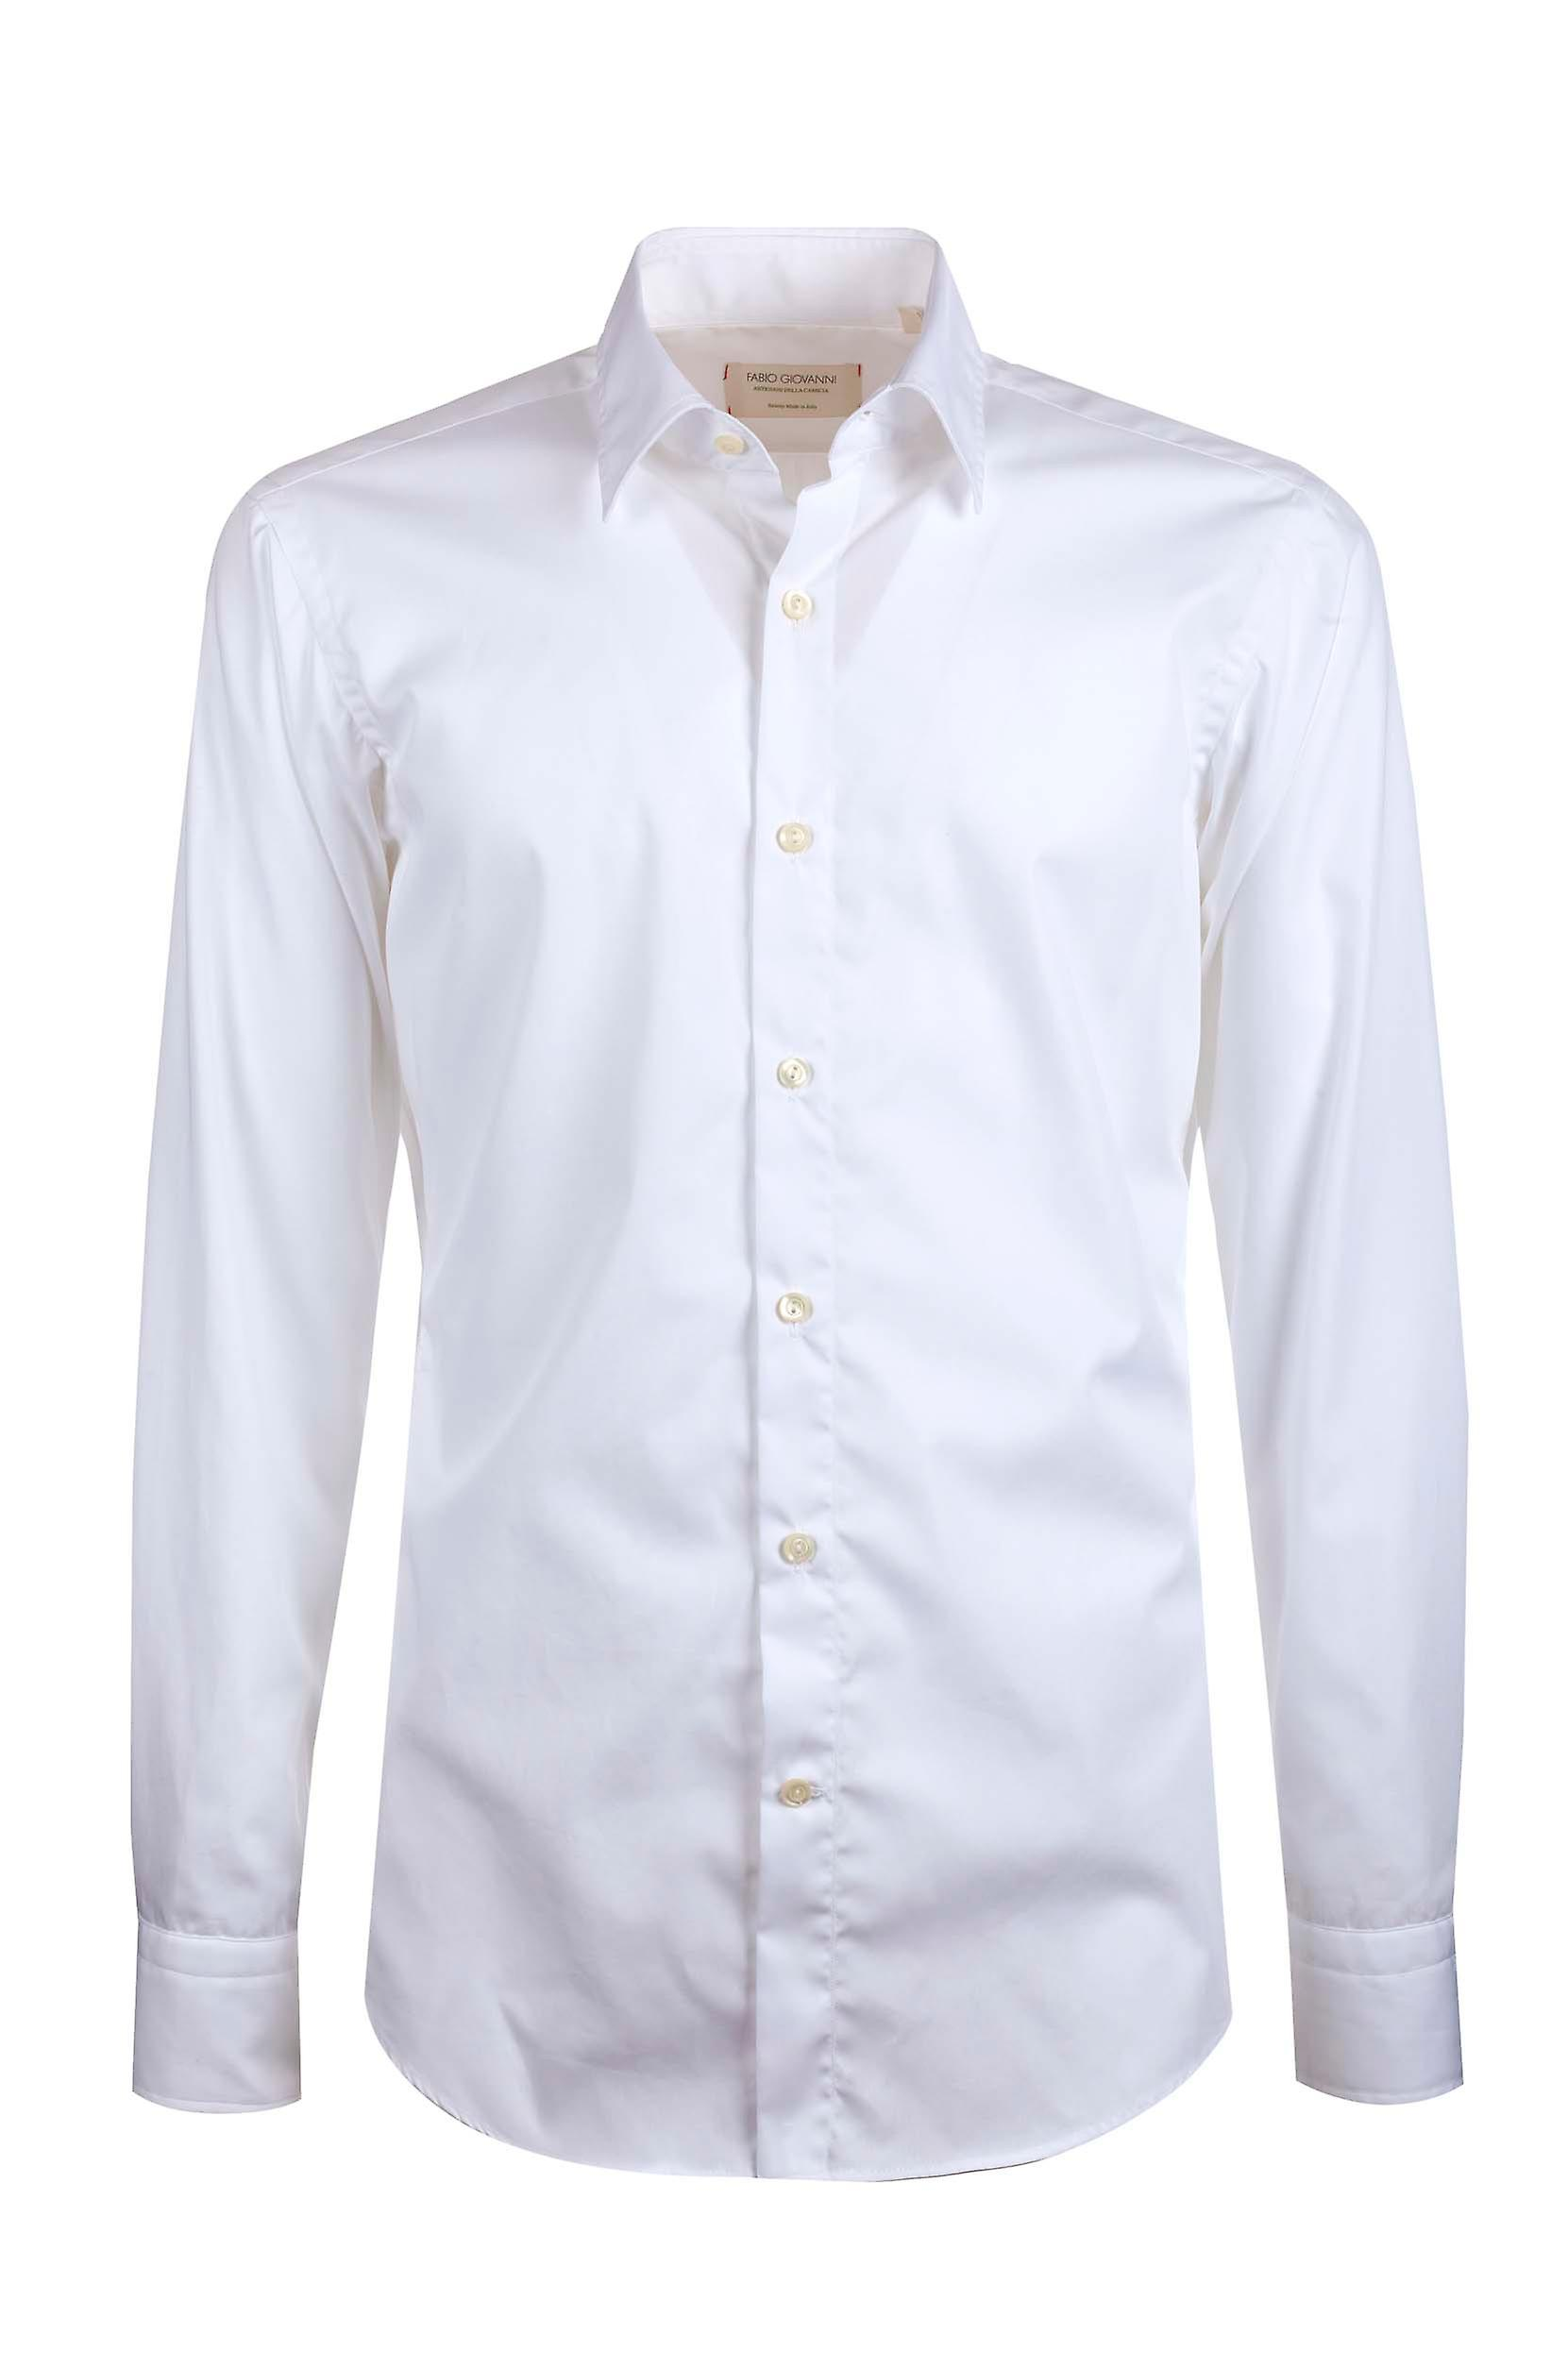 Fabio Giovanni Bellini Shirt Mens High Quality Italian Stretch